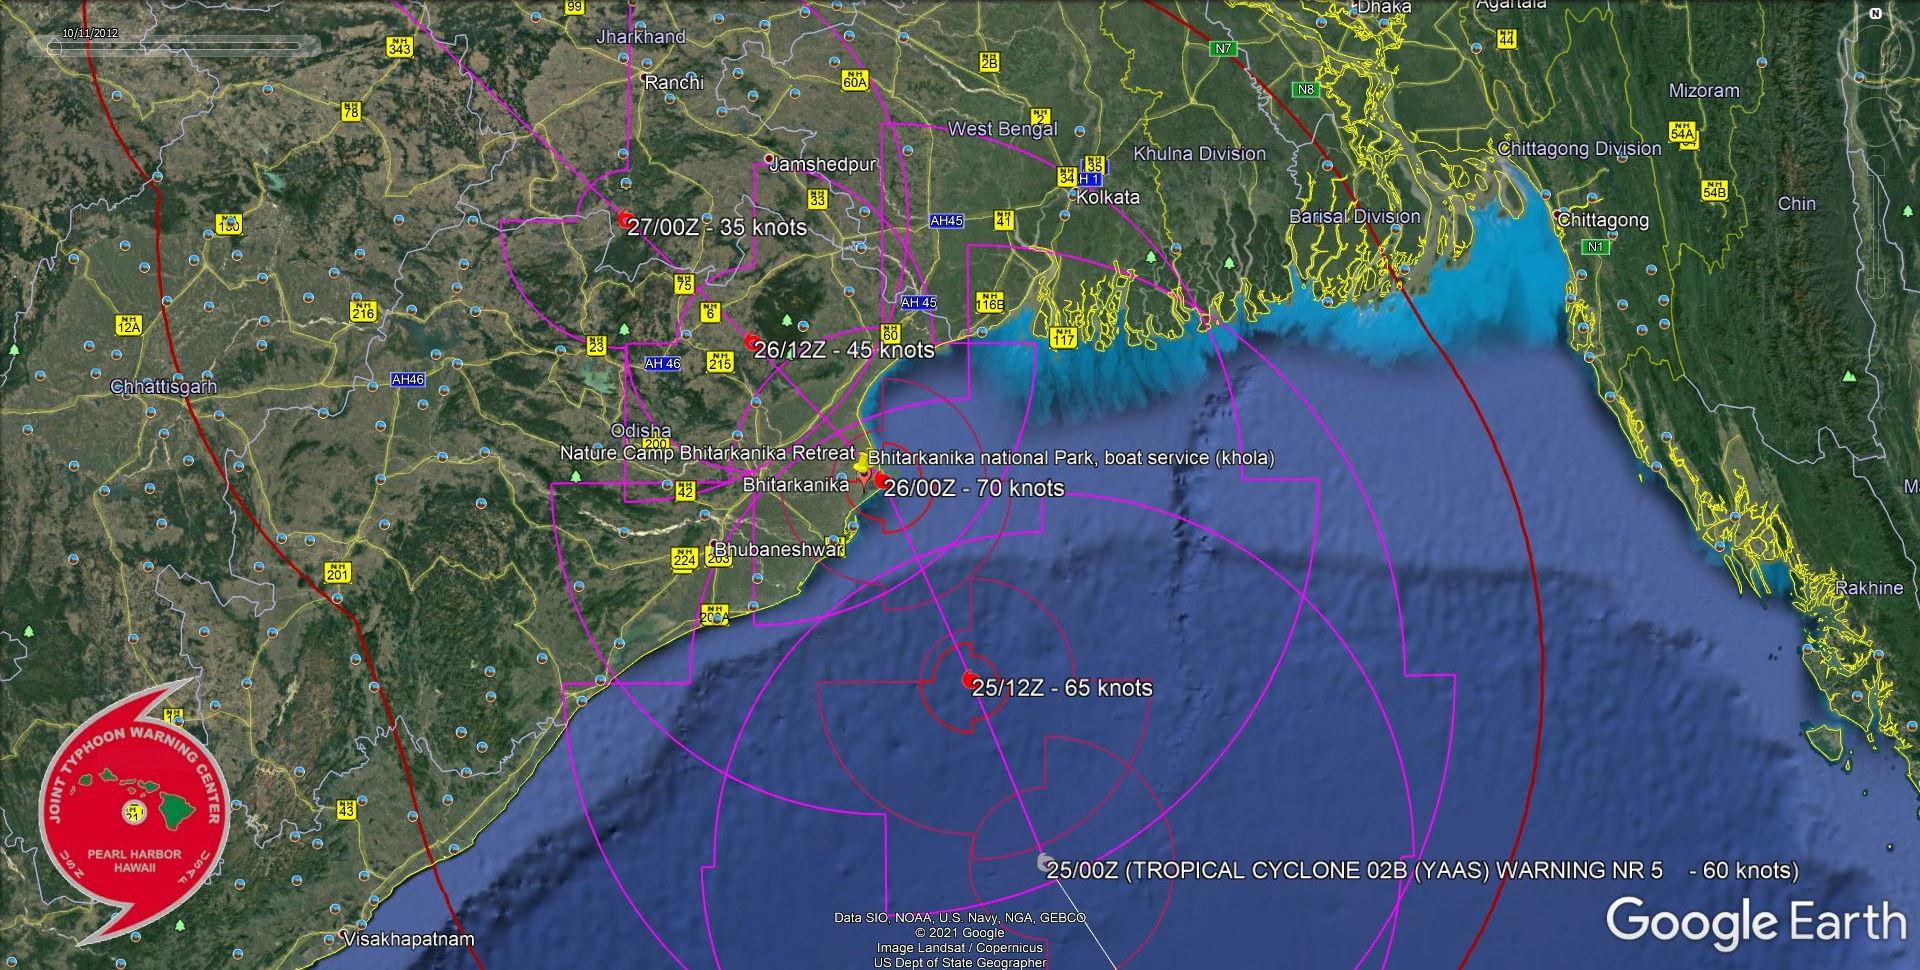 TC 02B(YAAS). WARNING 5. FORECAST LANDFALL AREA NEAR BHITARKANINKA NATIONAL PARK IN 24H.